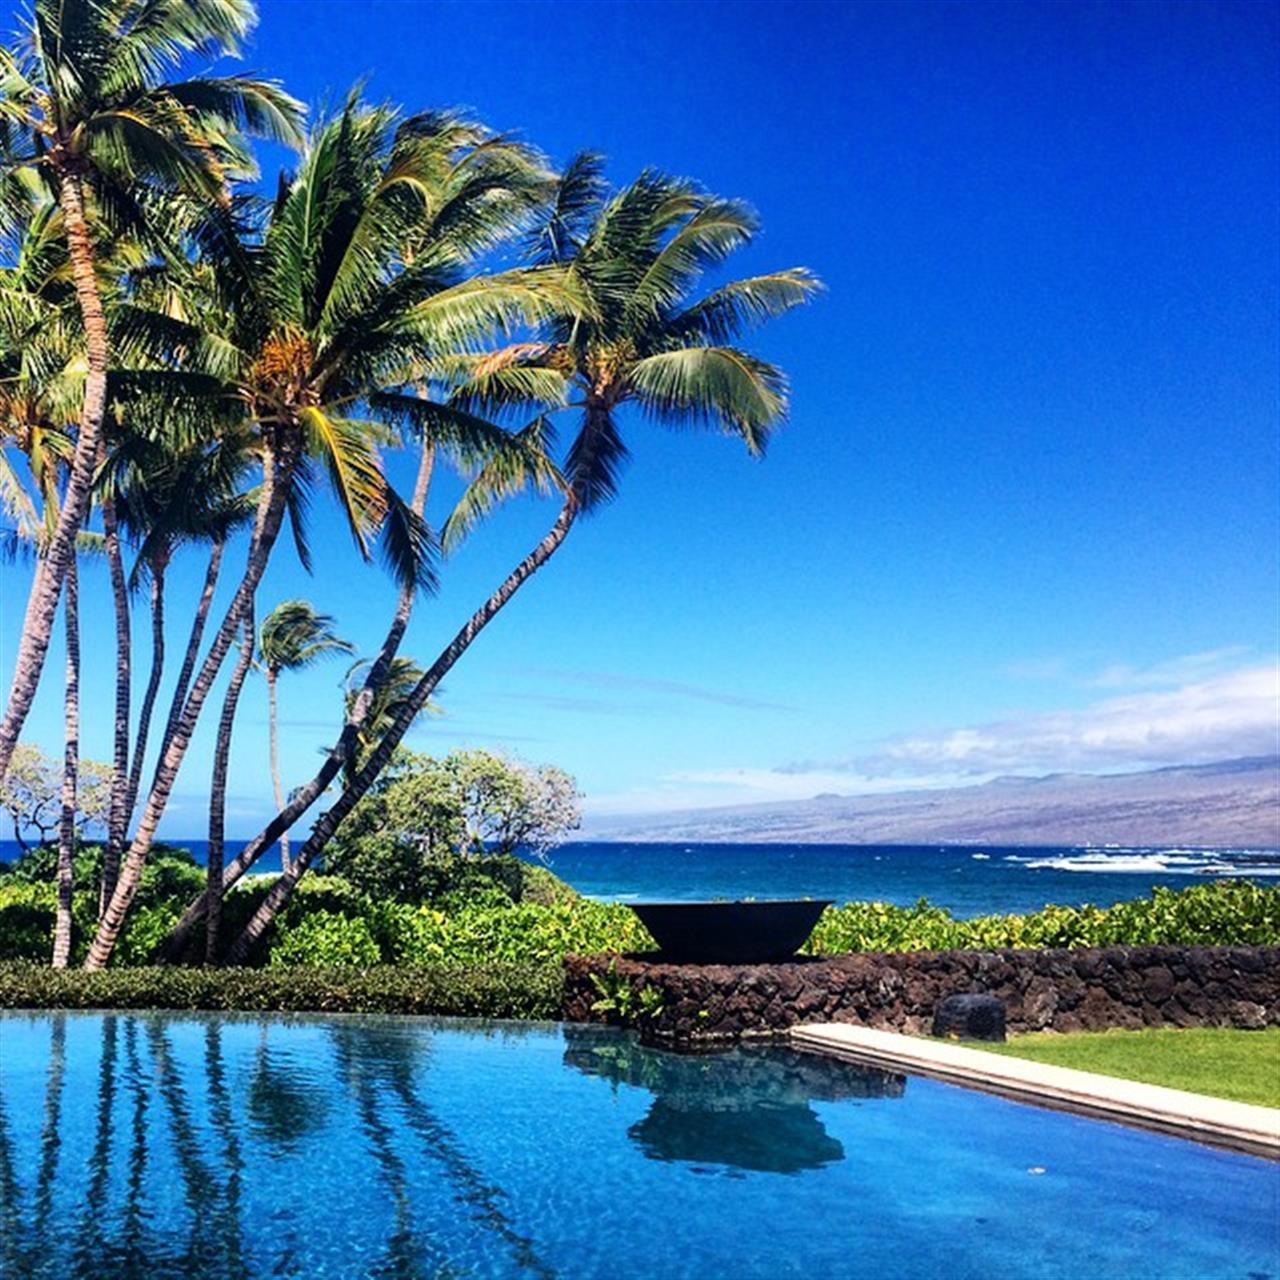 Today's #milliondollar view! Perfect Hawaii day-sun sand and tradewinds! #bigislandrealestate #bigisland #hawaiilife #maunalani #beingbrooke #leadingRElocal